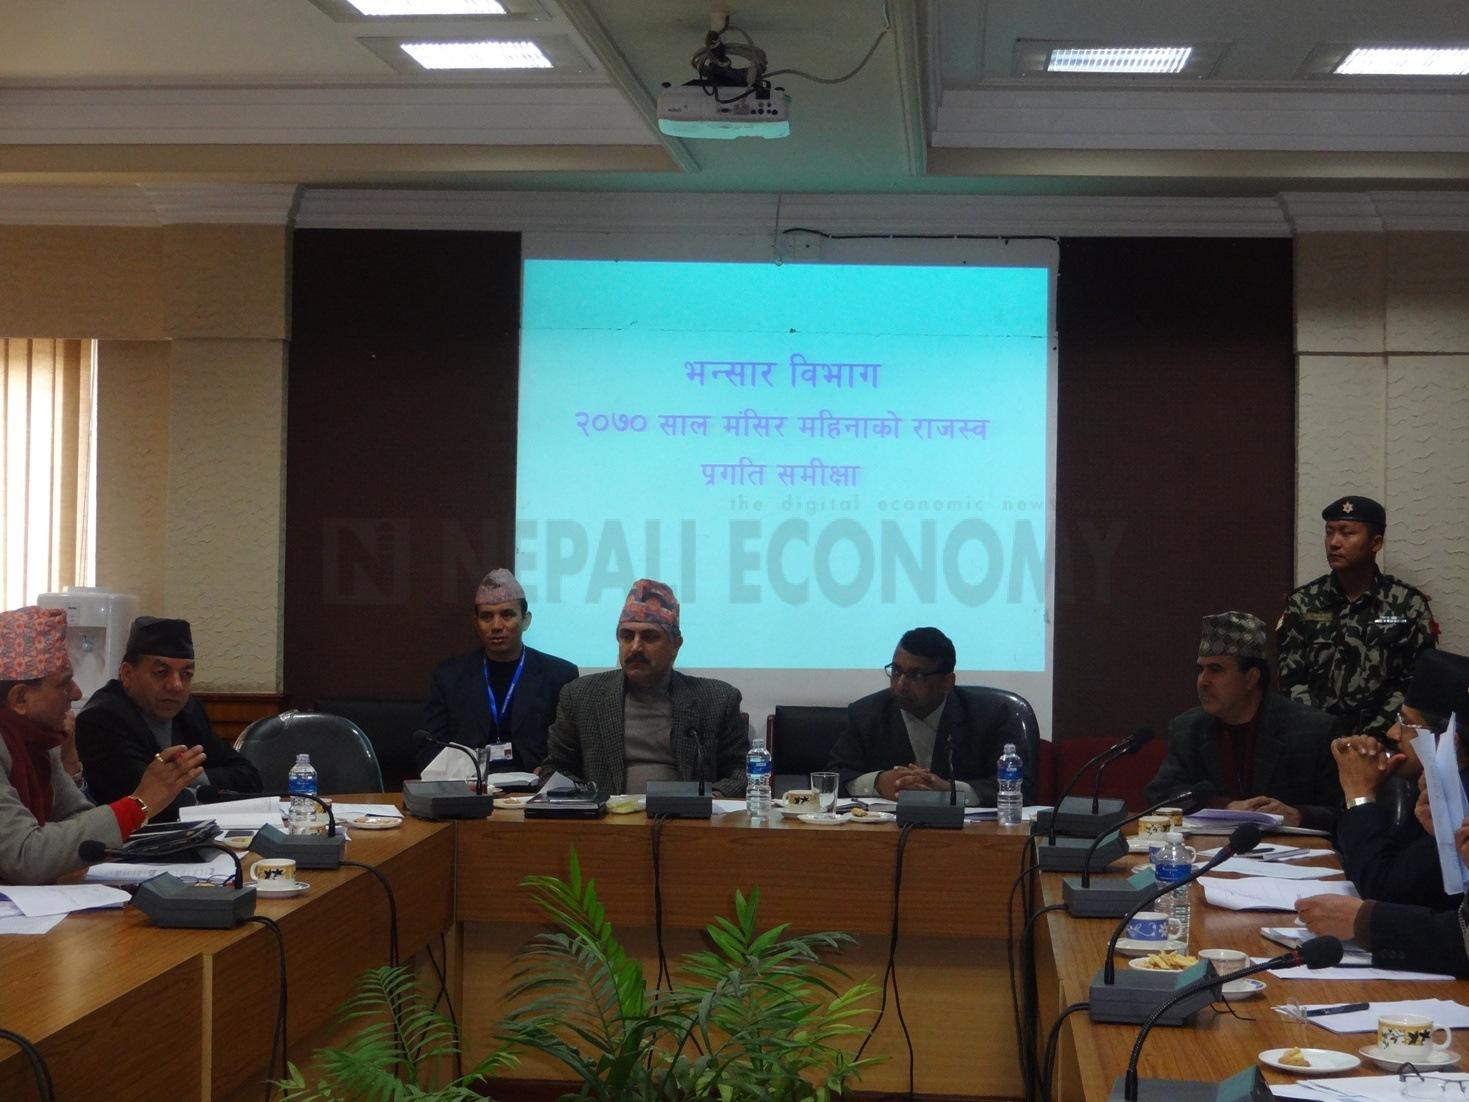 Revenue administration becoming inefficient, fails to meet revenue mobilisation target